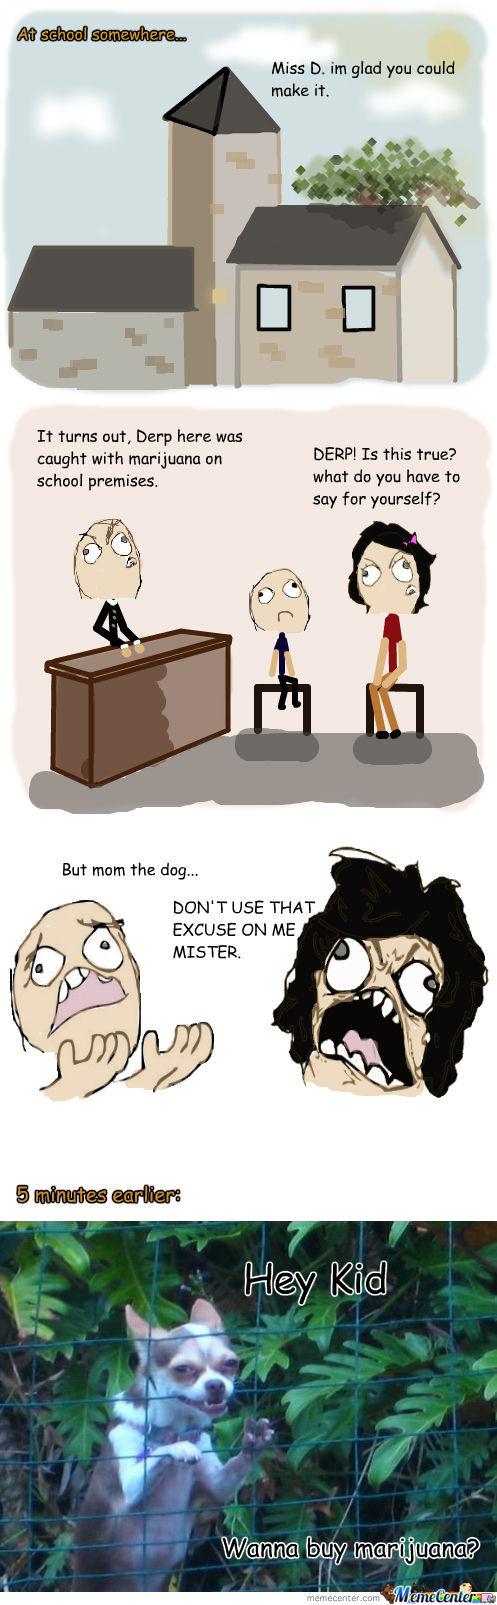 school drug dealing dog